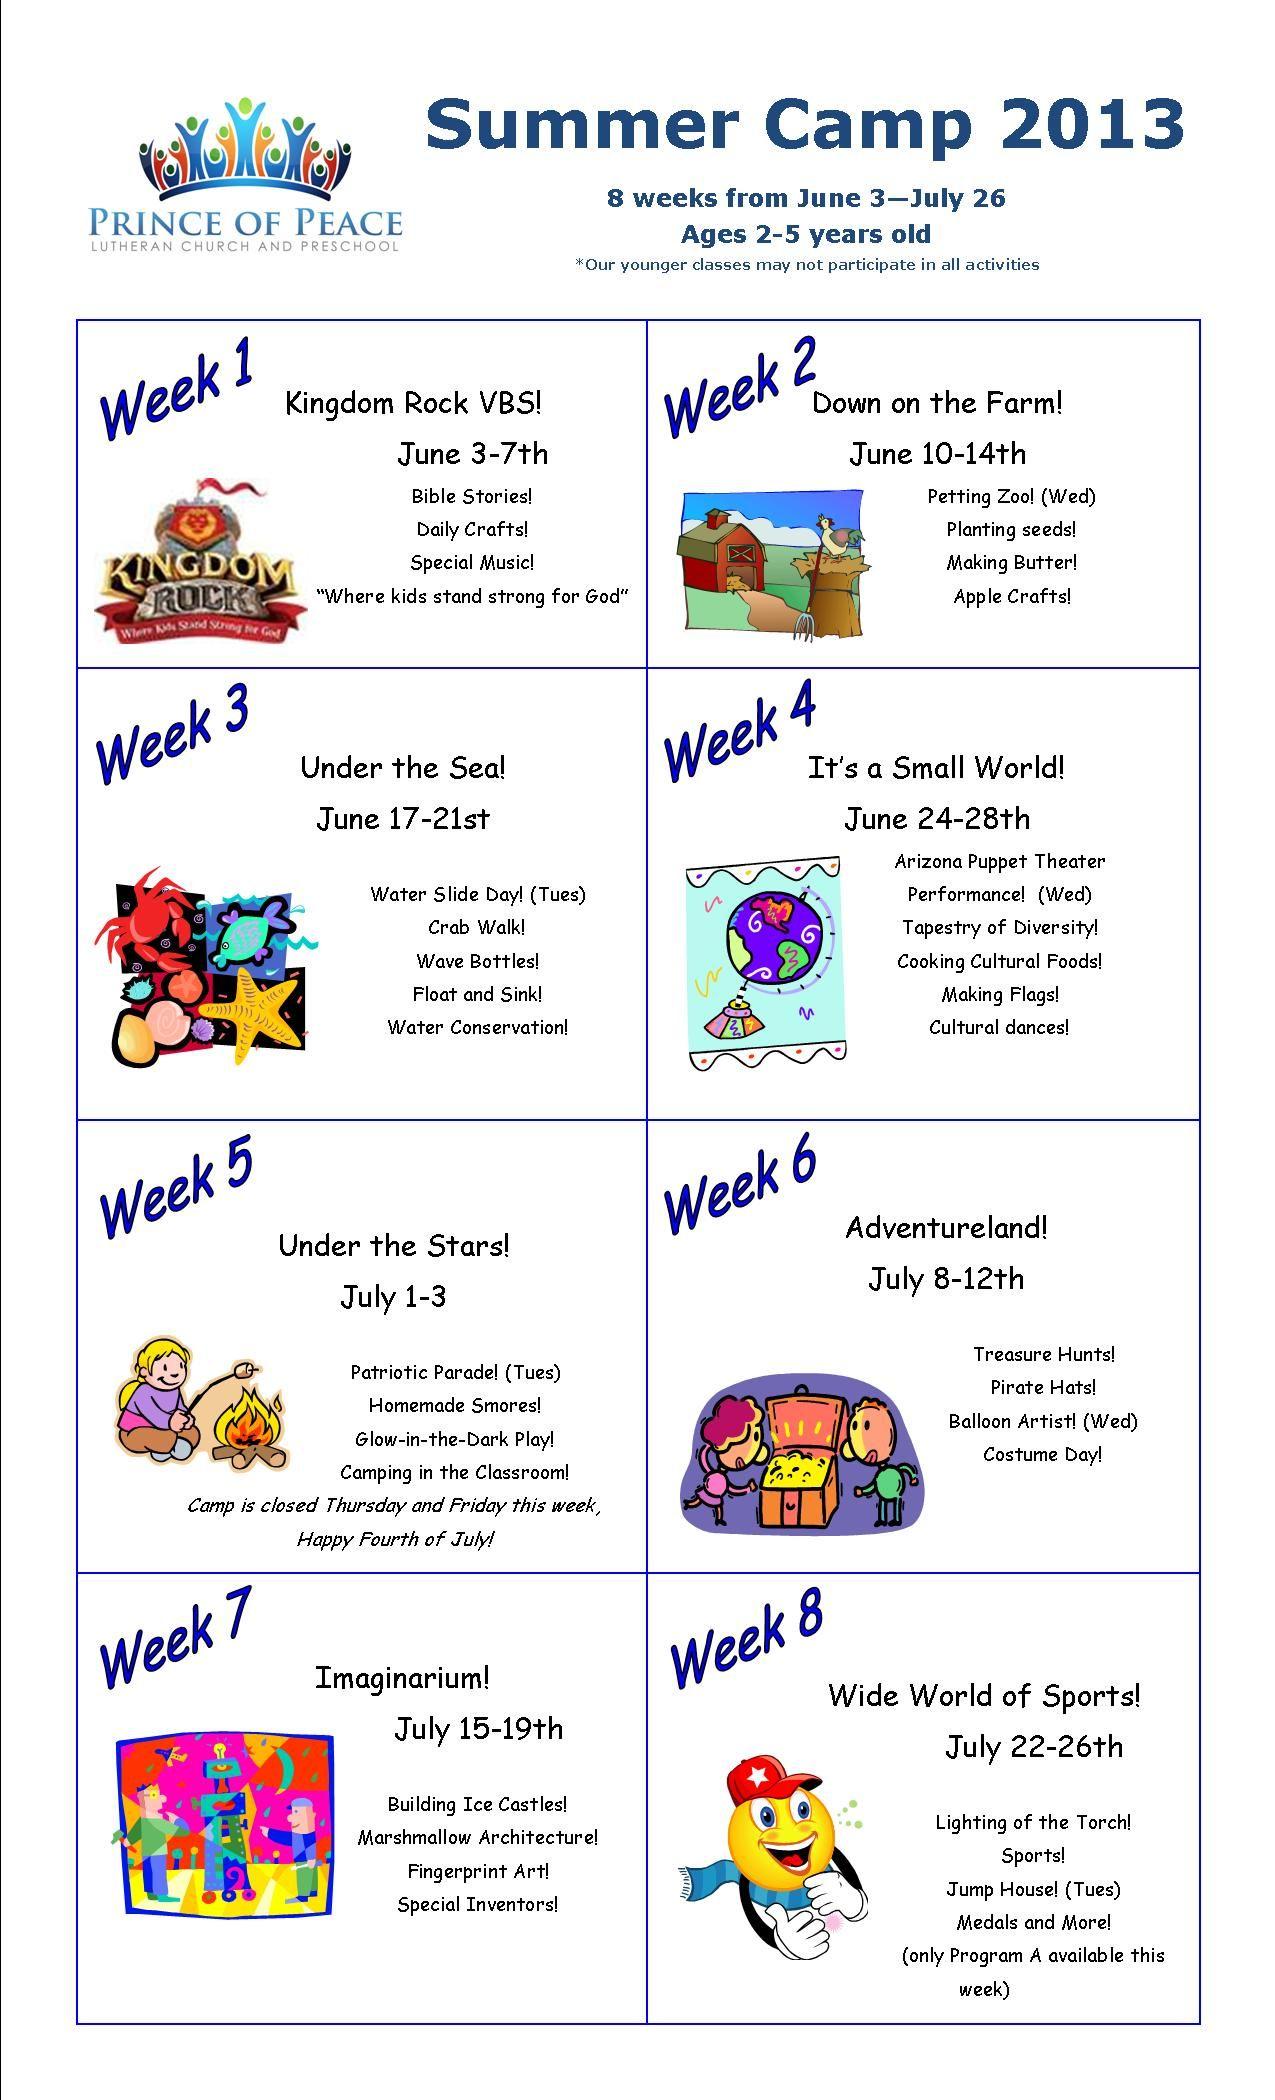 Weekly Calendar Ideas : Summer camp calendar i love this idea to devote a